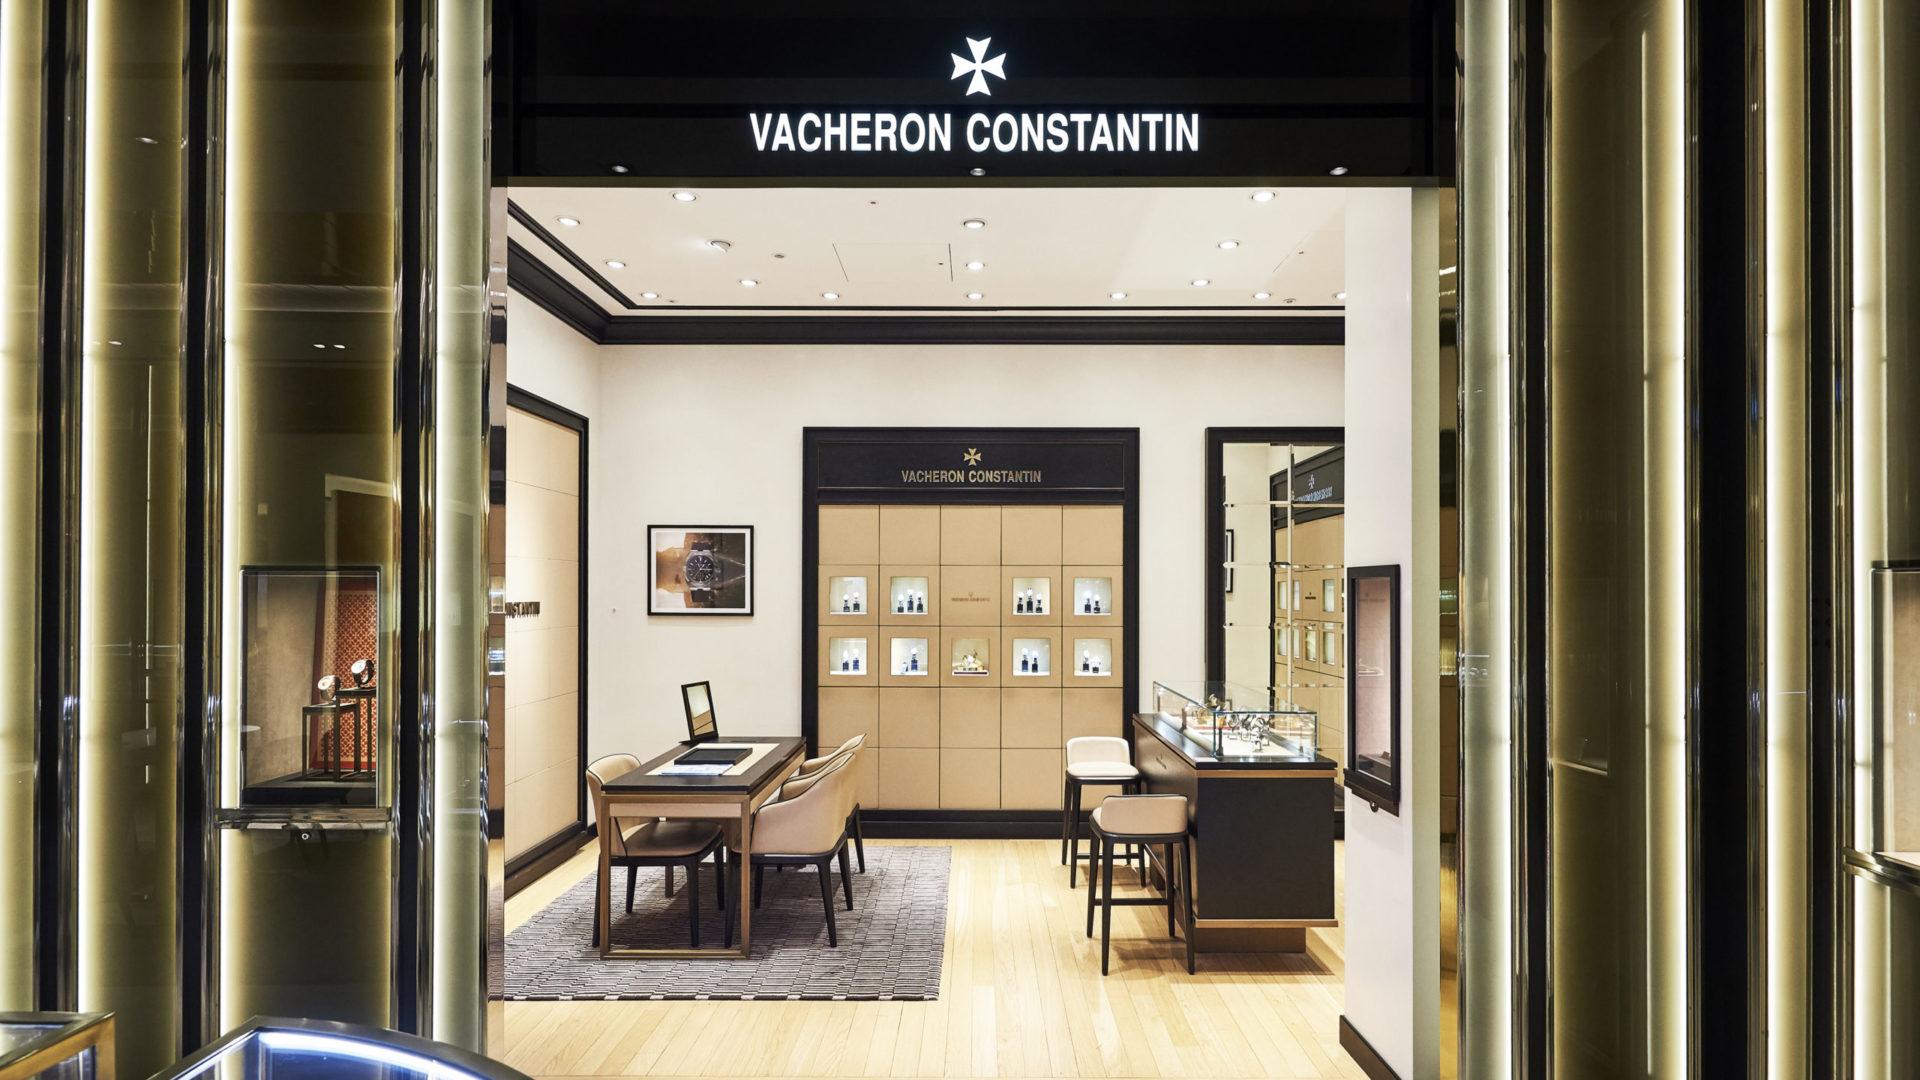 WoS Regent Street 461 Vacheron Constantin 88